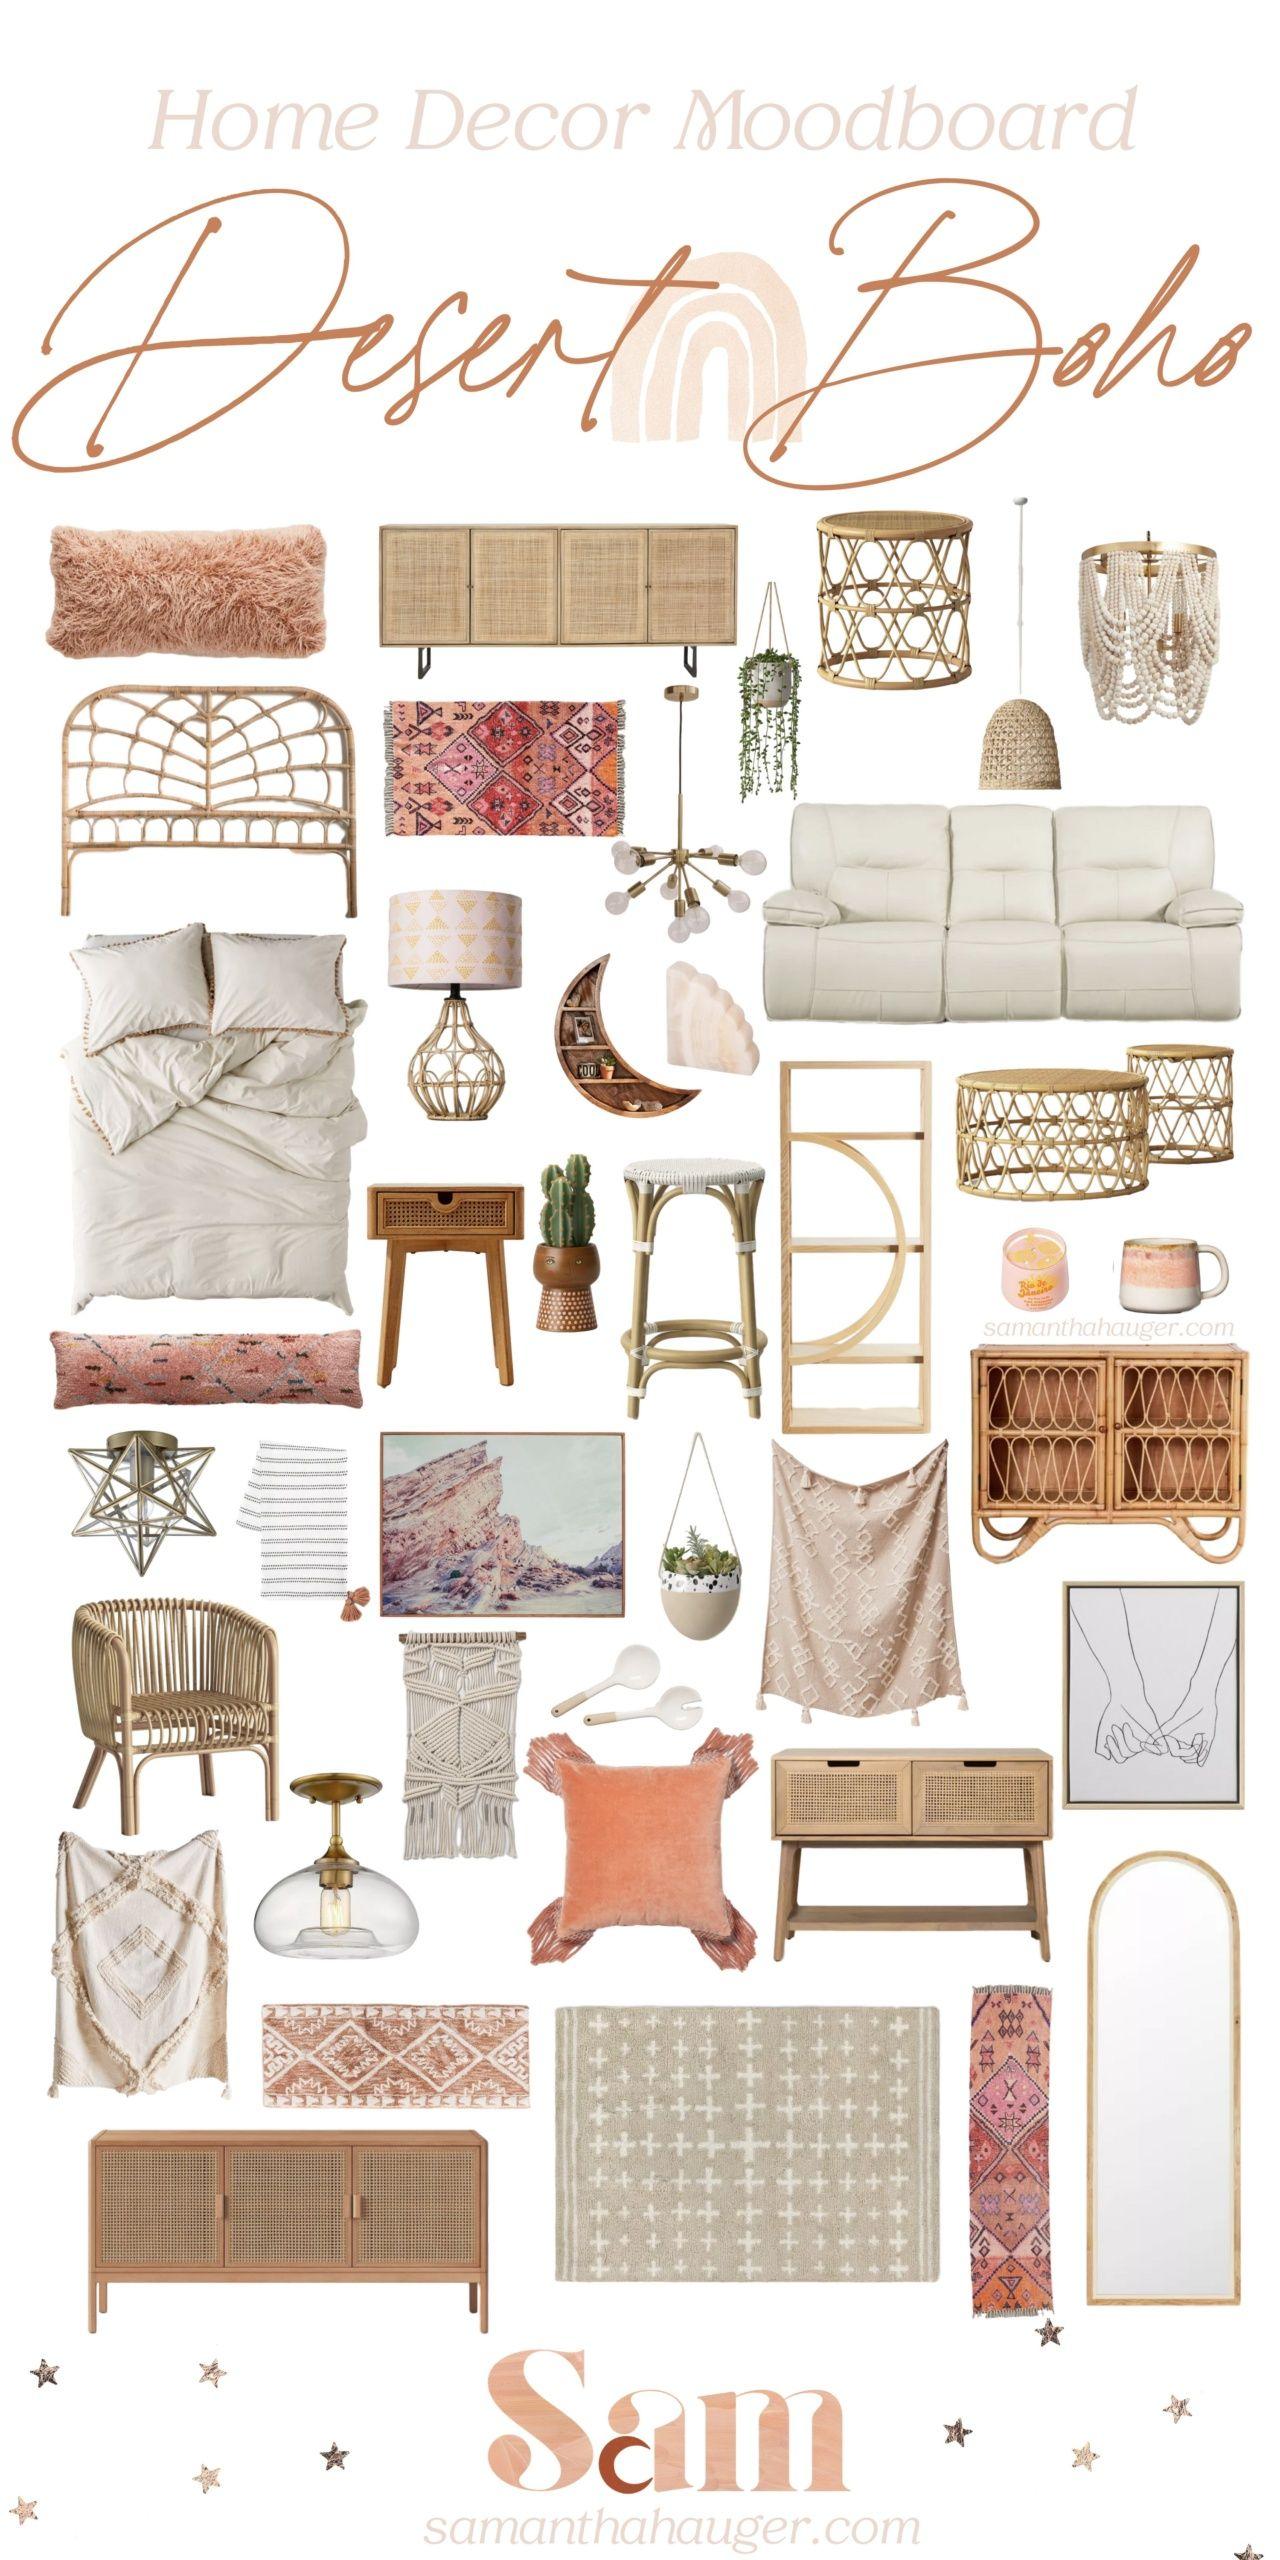 Boho Modern Home Decor Mood Board - Samantha Hauger in ...